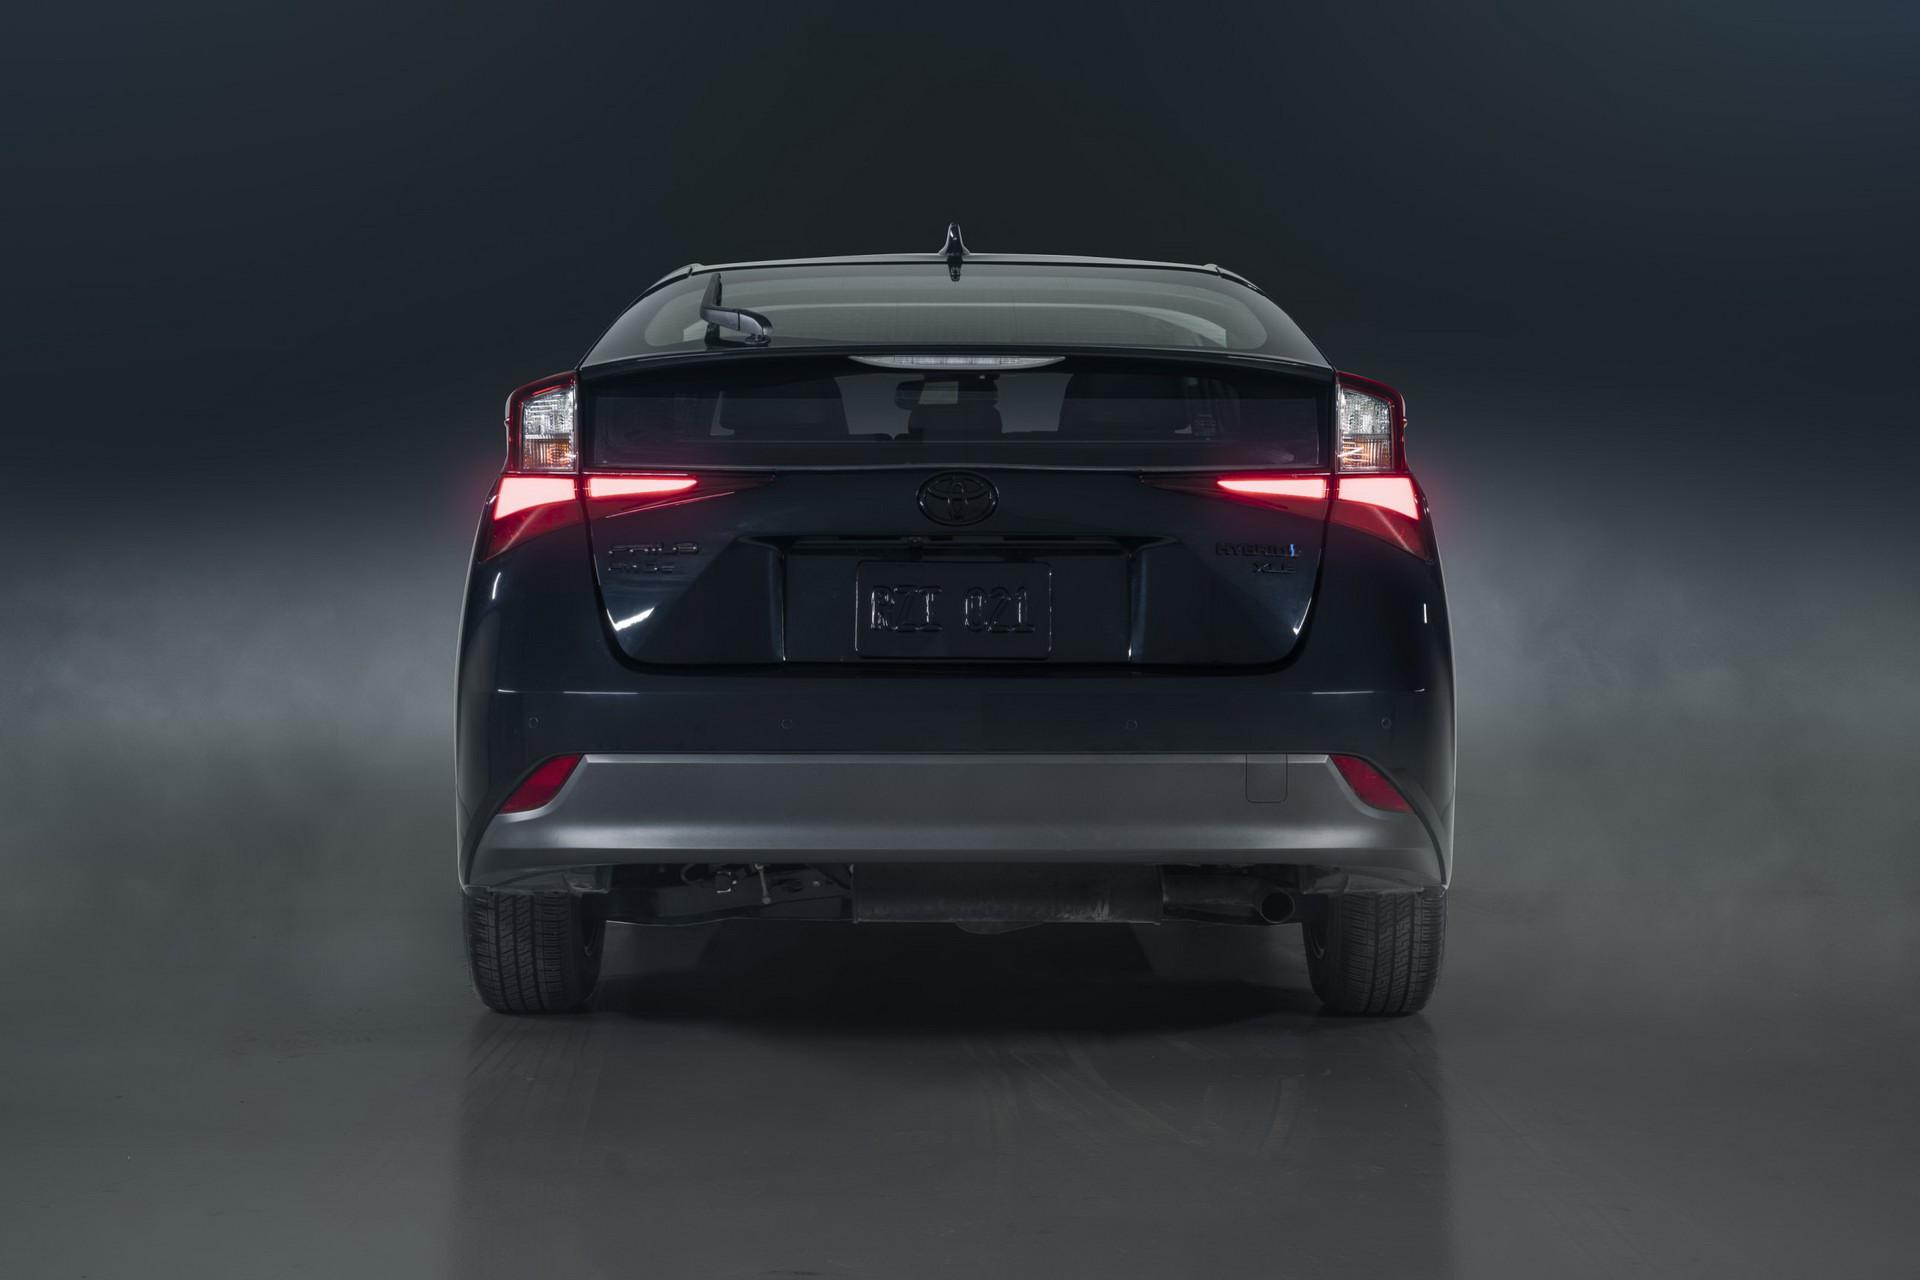 Toyota-Prius-Nightshade-Edition-7